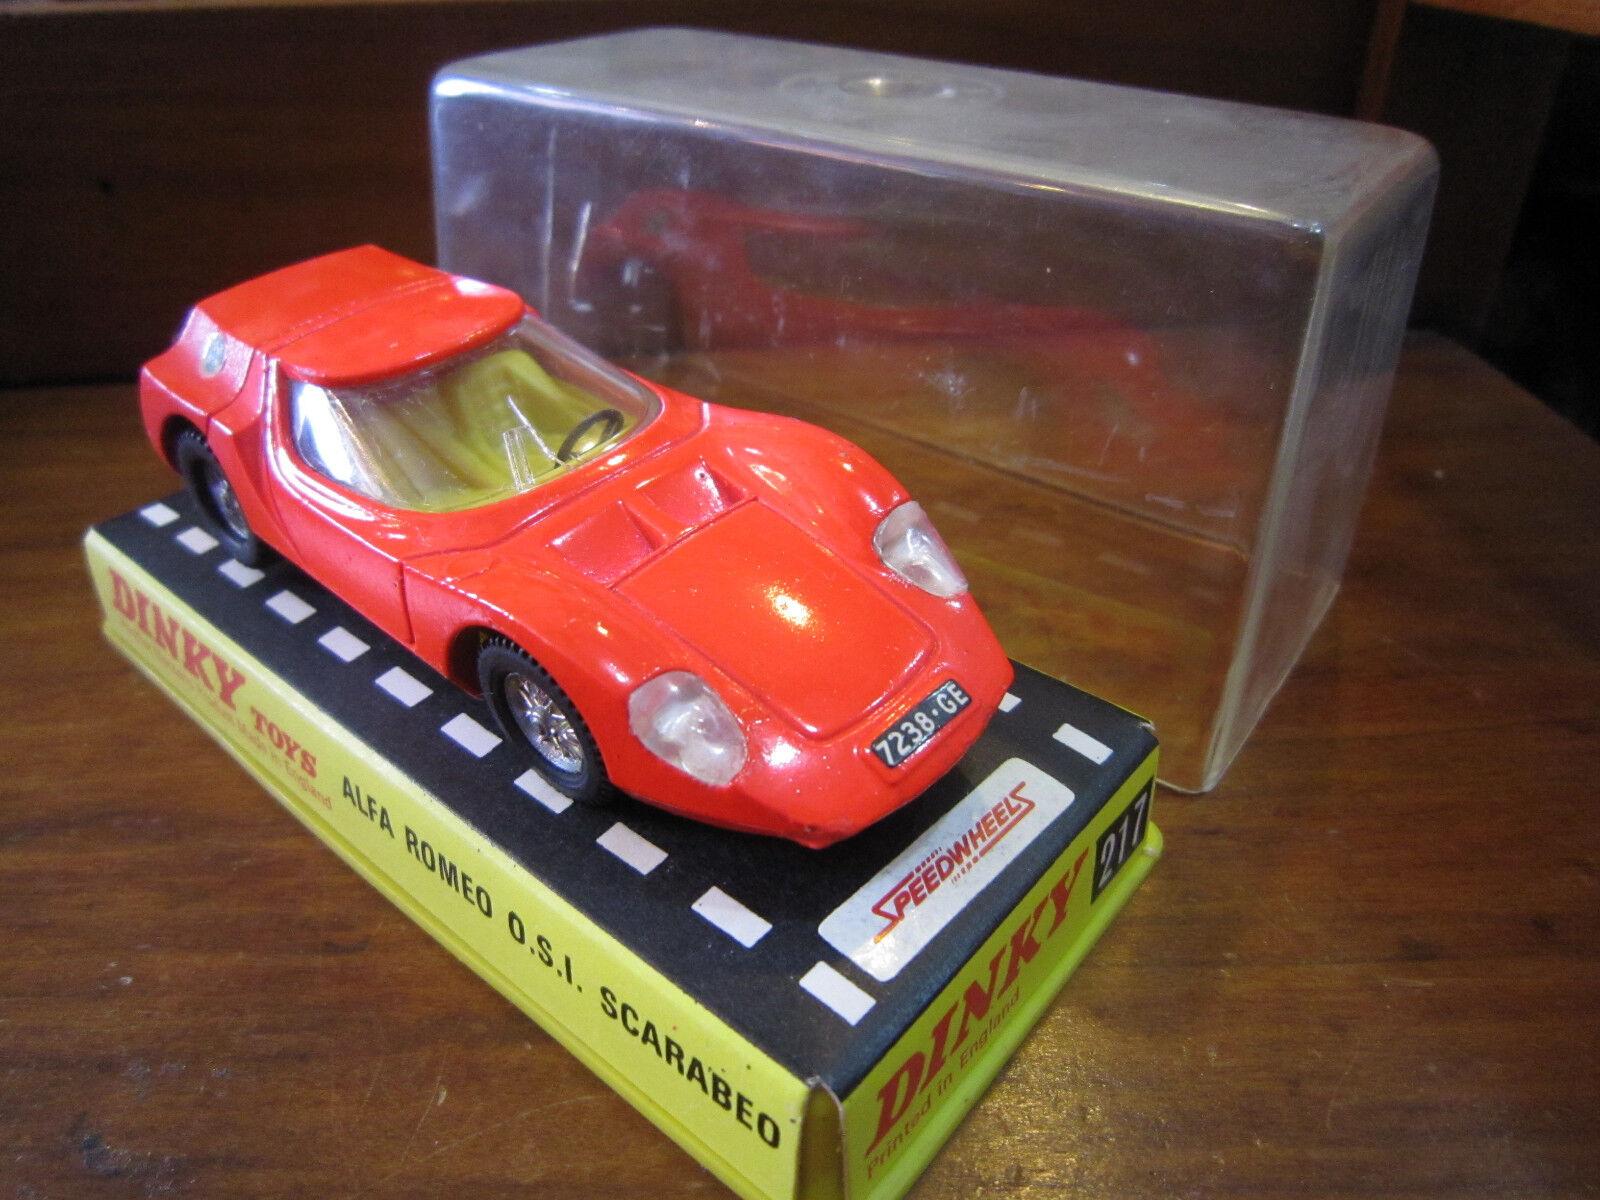 DINKY giocattoli 217 - ALFA ROMEO O.S.I. SautoABEO -1 43- DIECAST -WITH scatola- VINTAGE